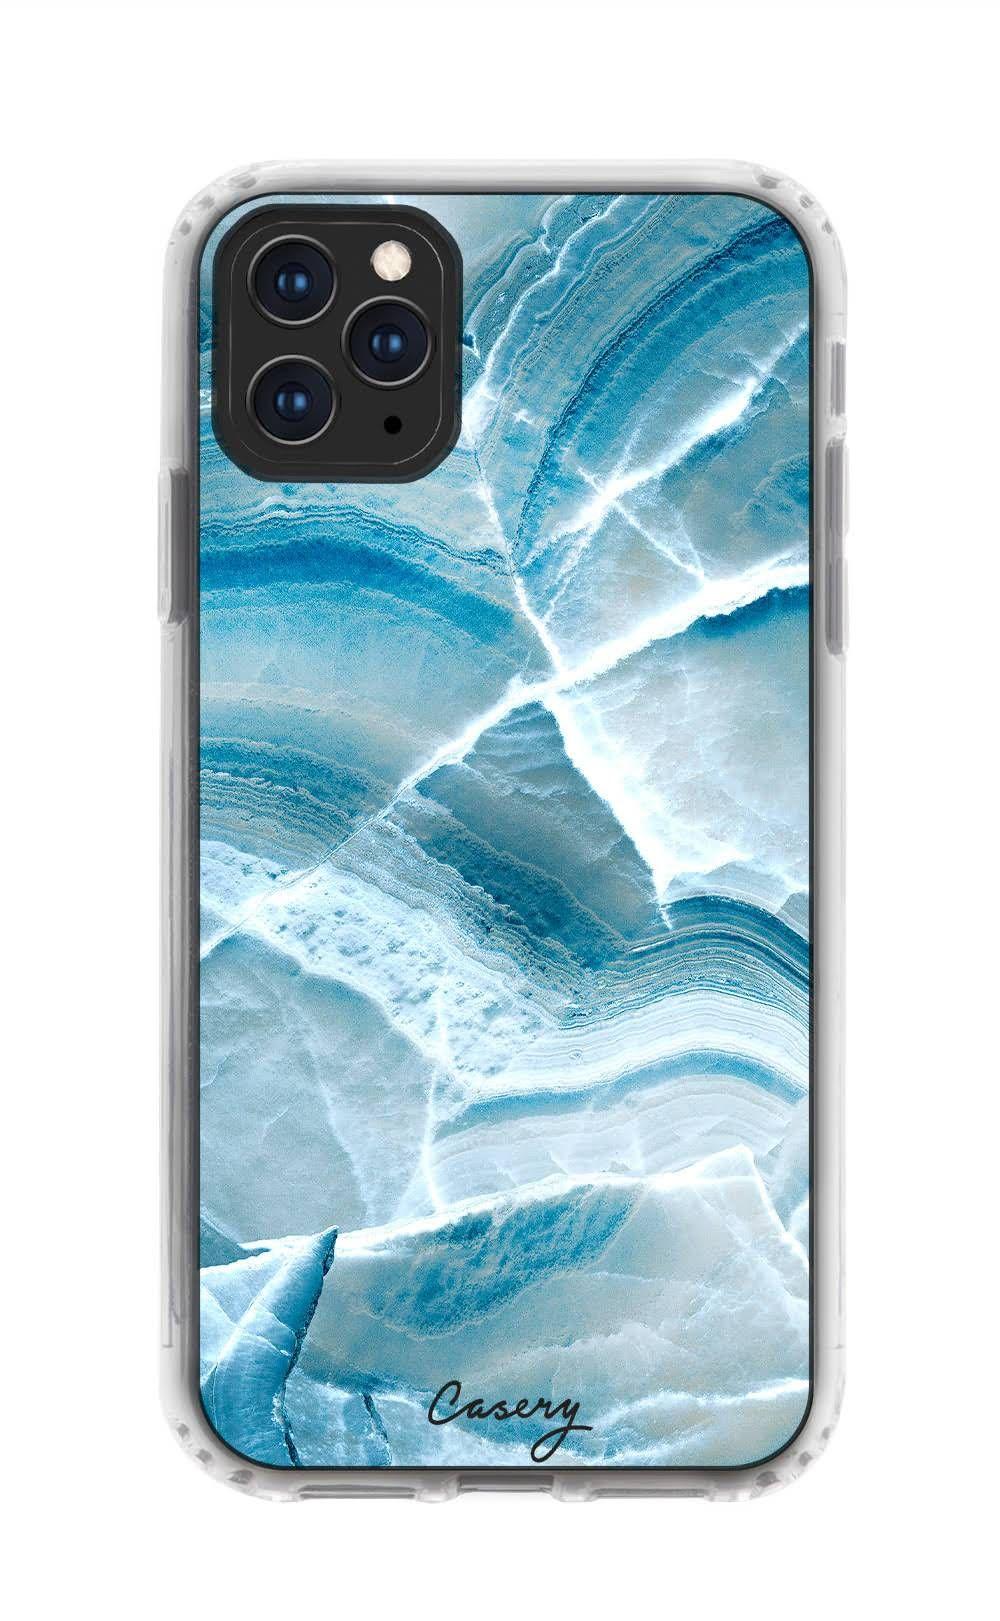 Aqua Marble Iphone phone cases, Iphone cases bling